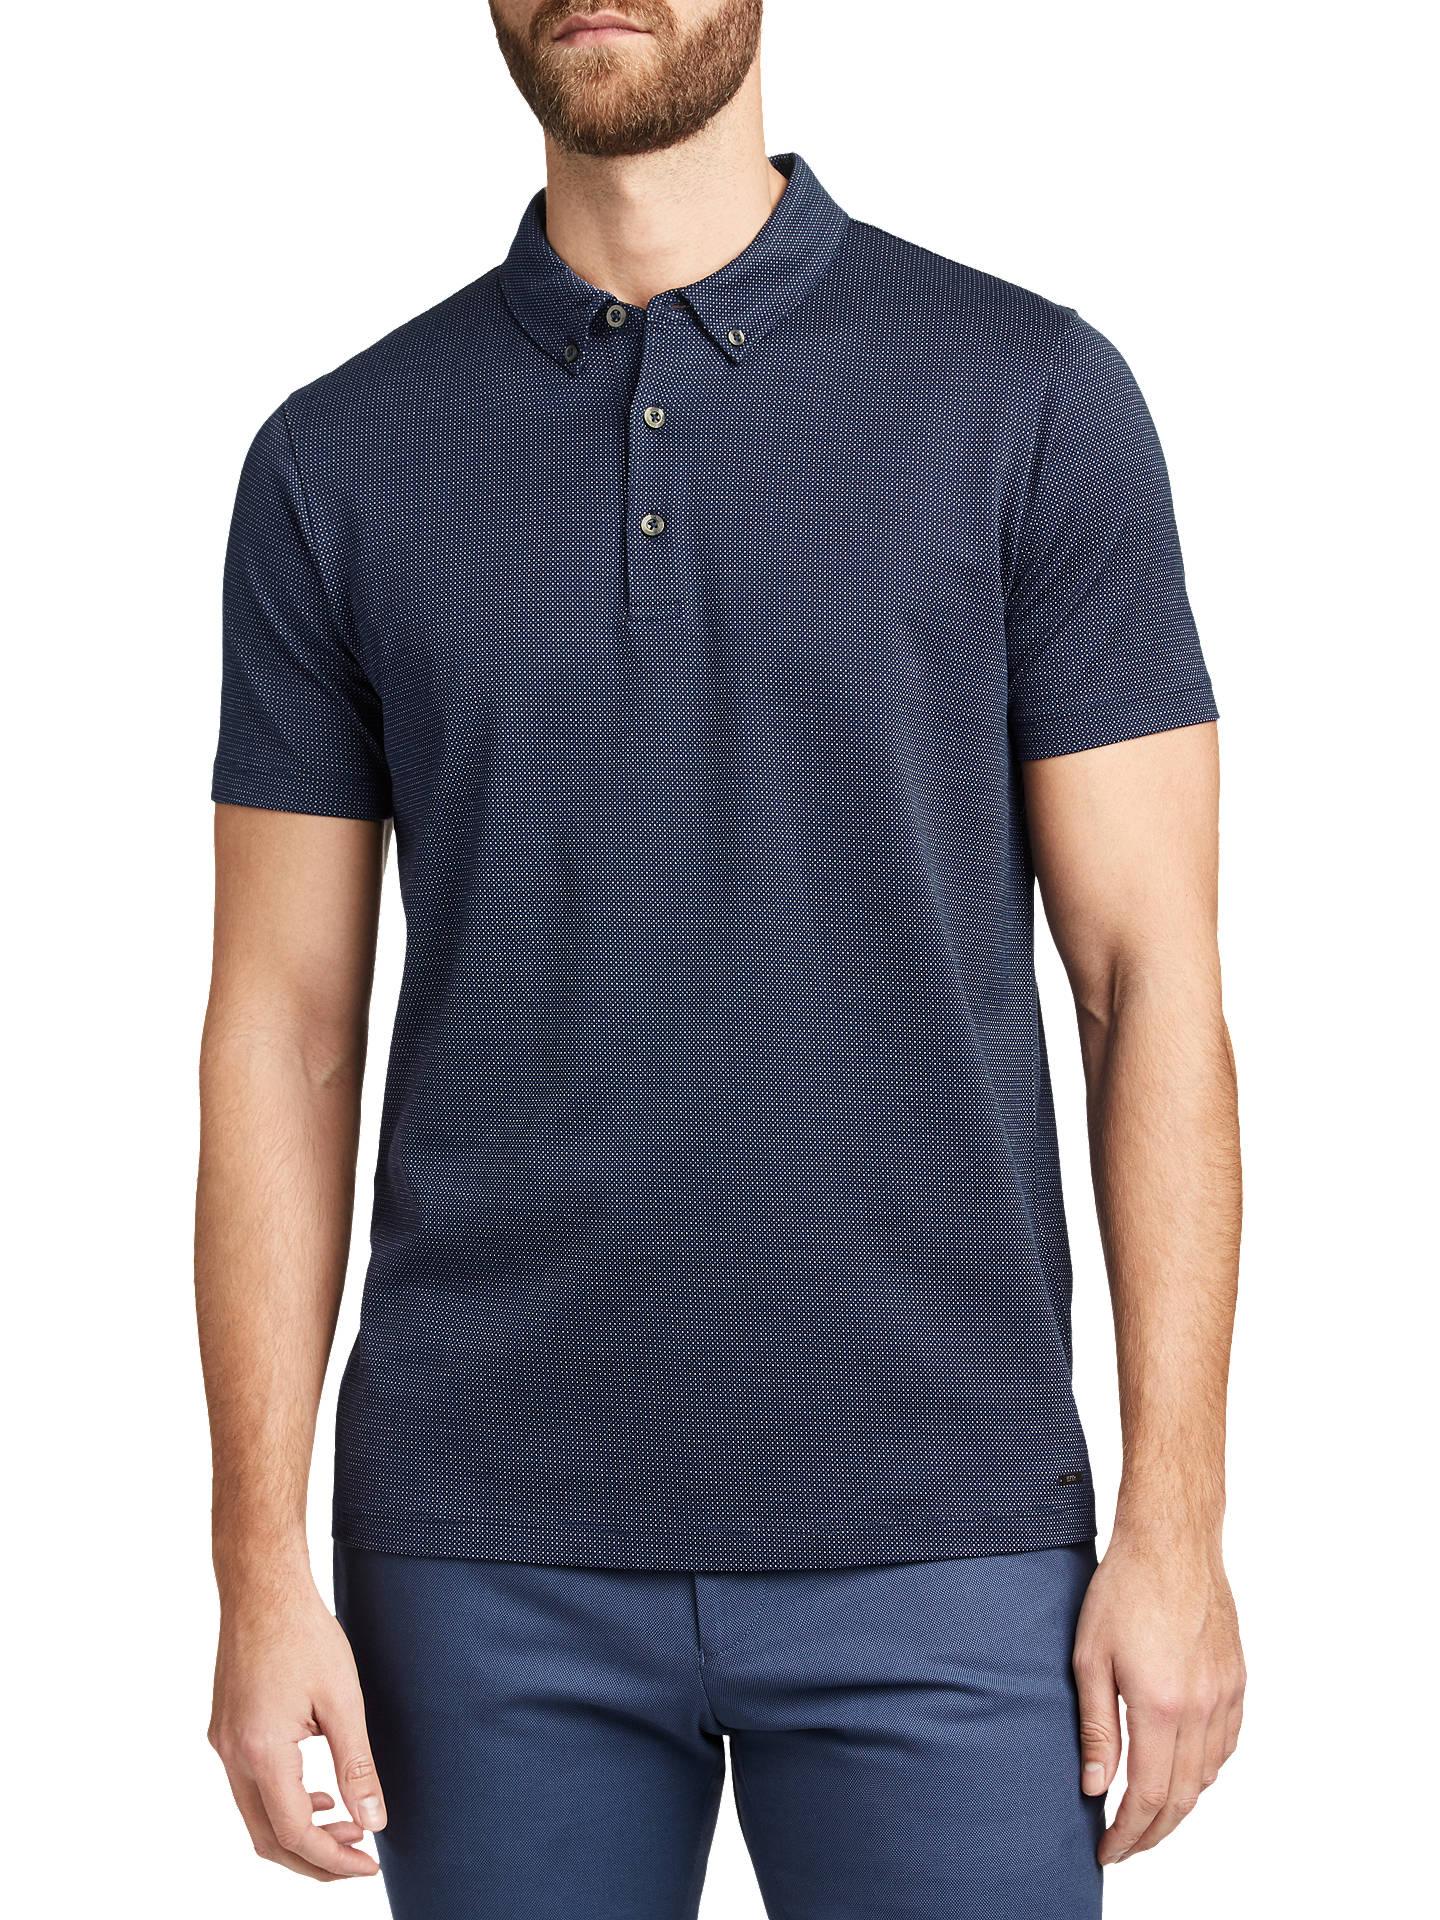 0cdddce0 Buy HUGO by Hugo Boss Daprio Mercerised Micro Jacquard Polo Shirt, Navy, S  Online ...